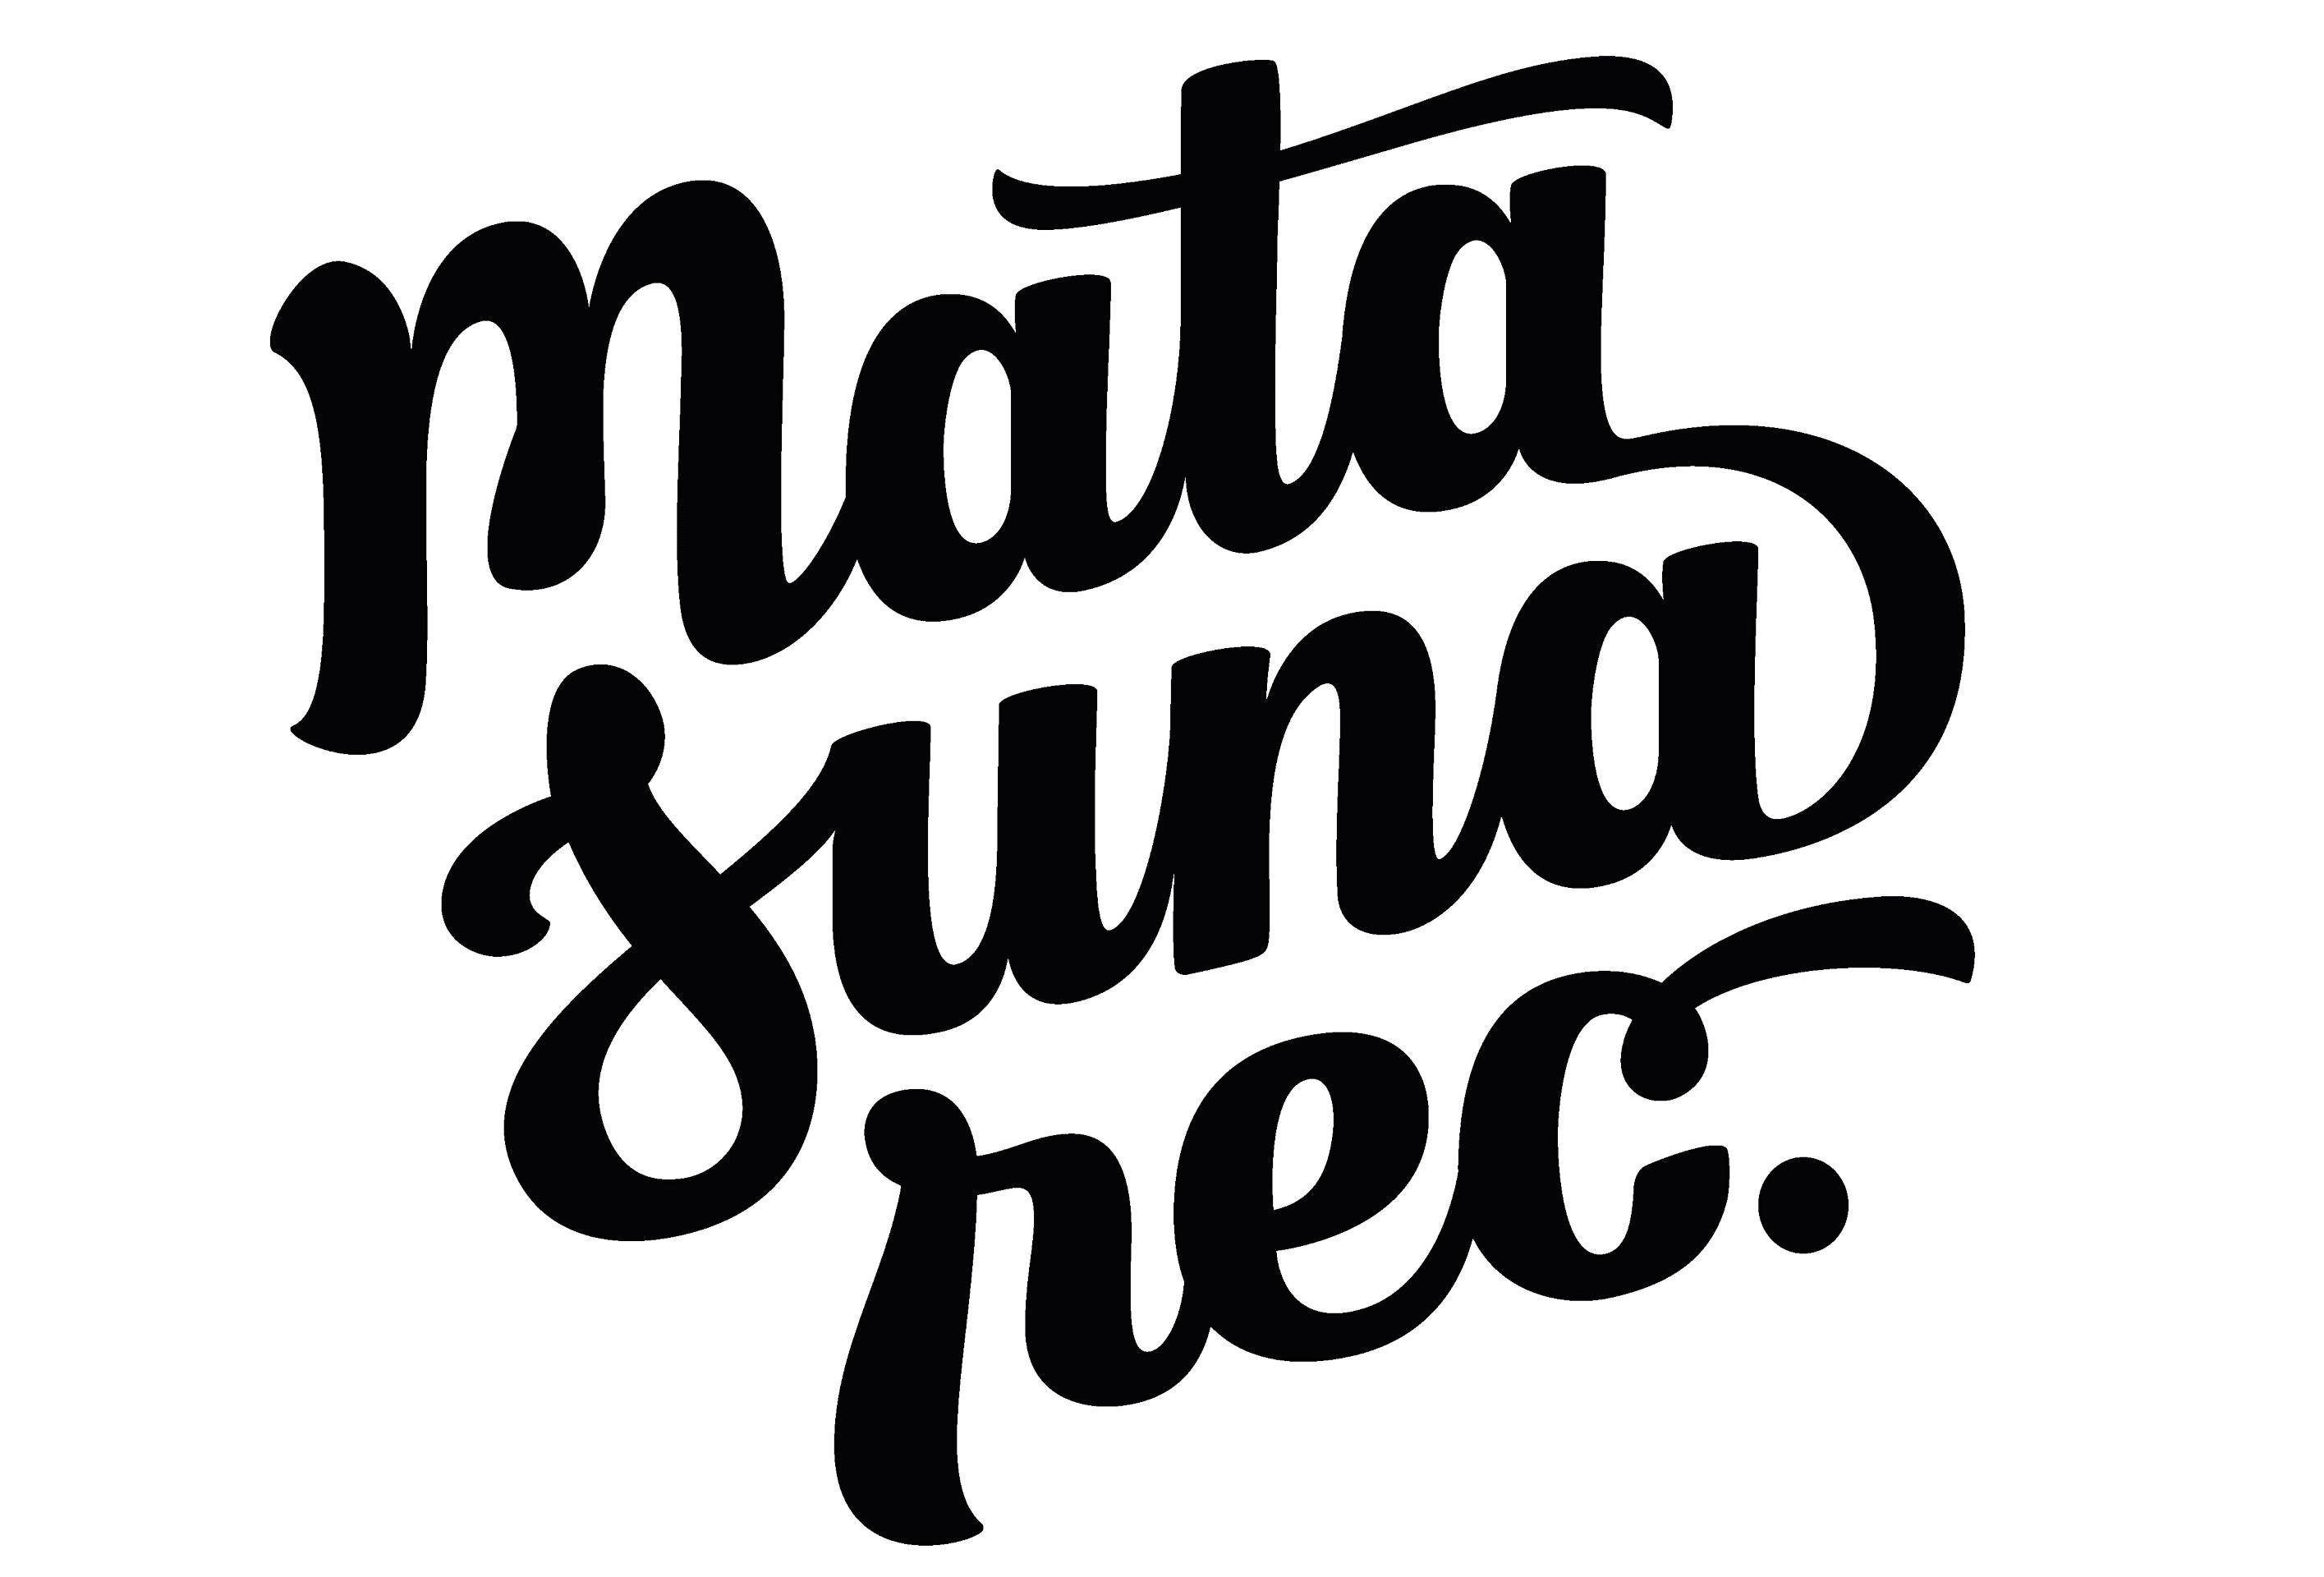 Matasuna Records